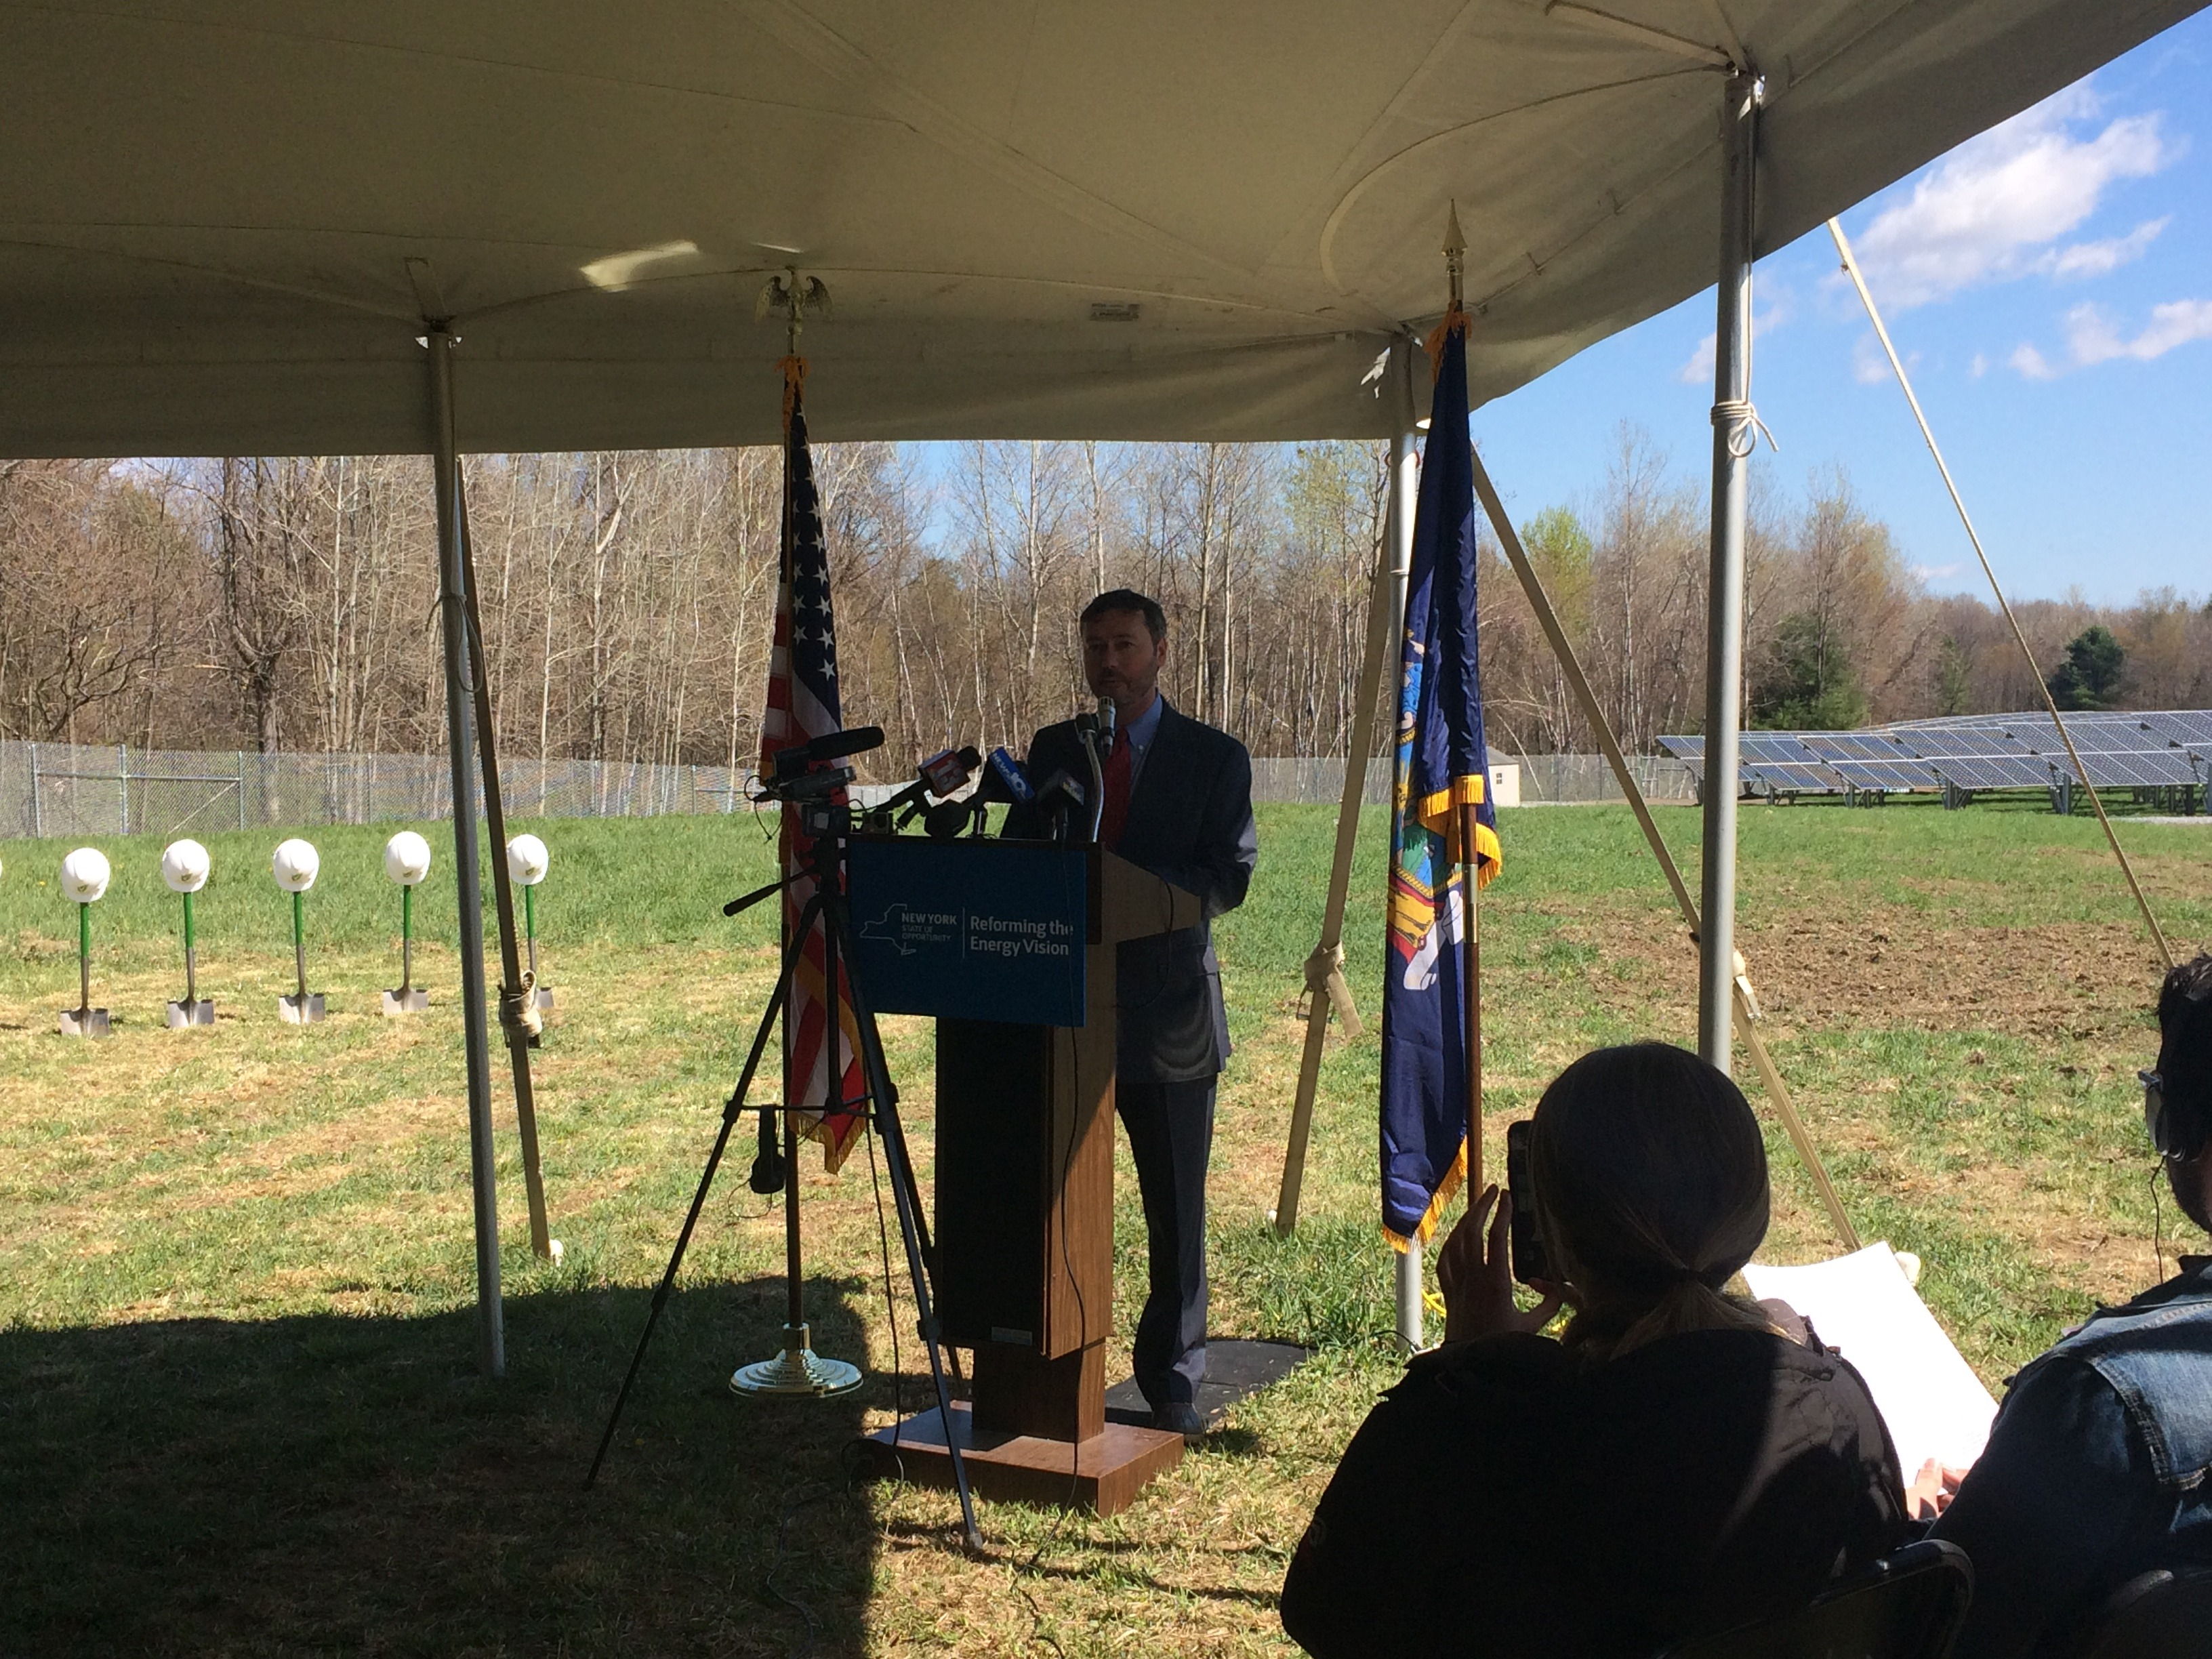 Halfmoon Community Solar Energy Project Speakers